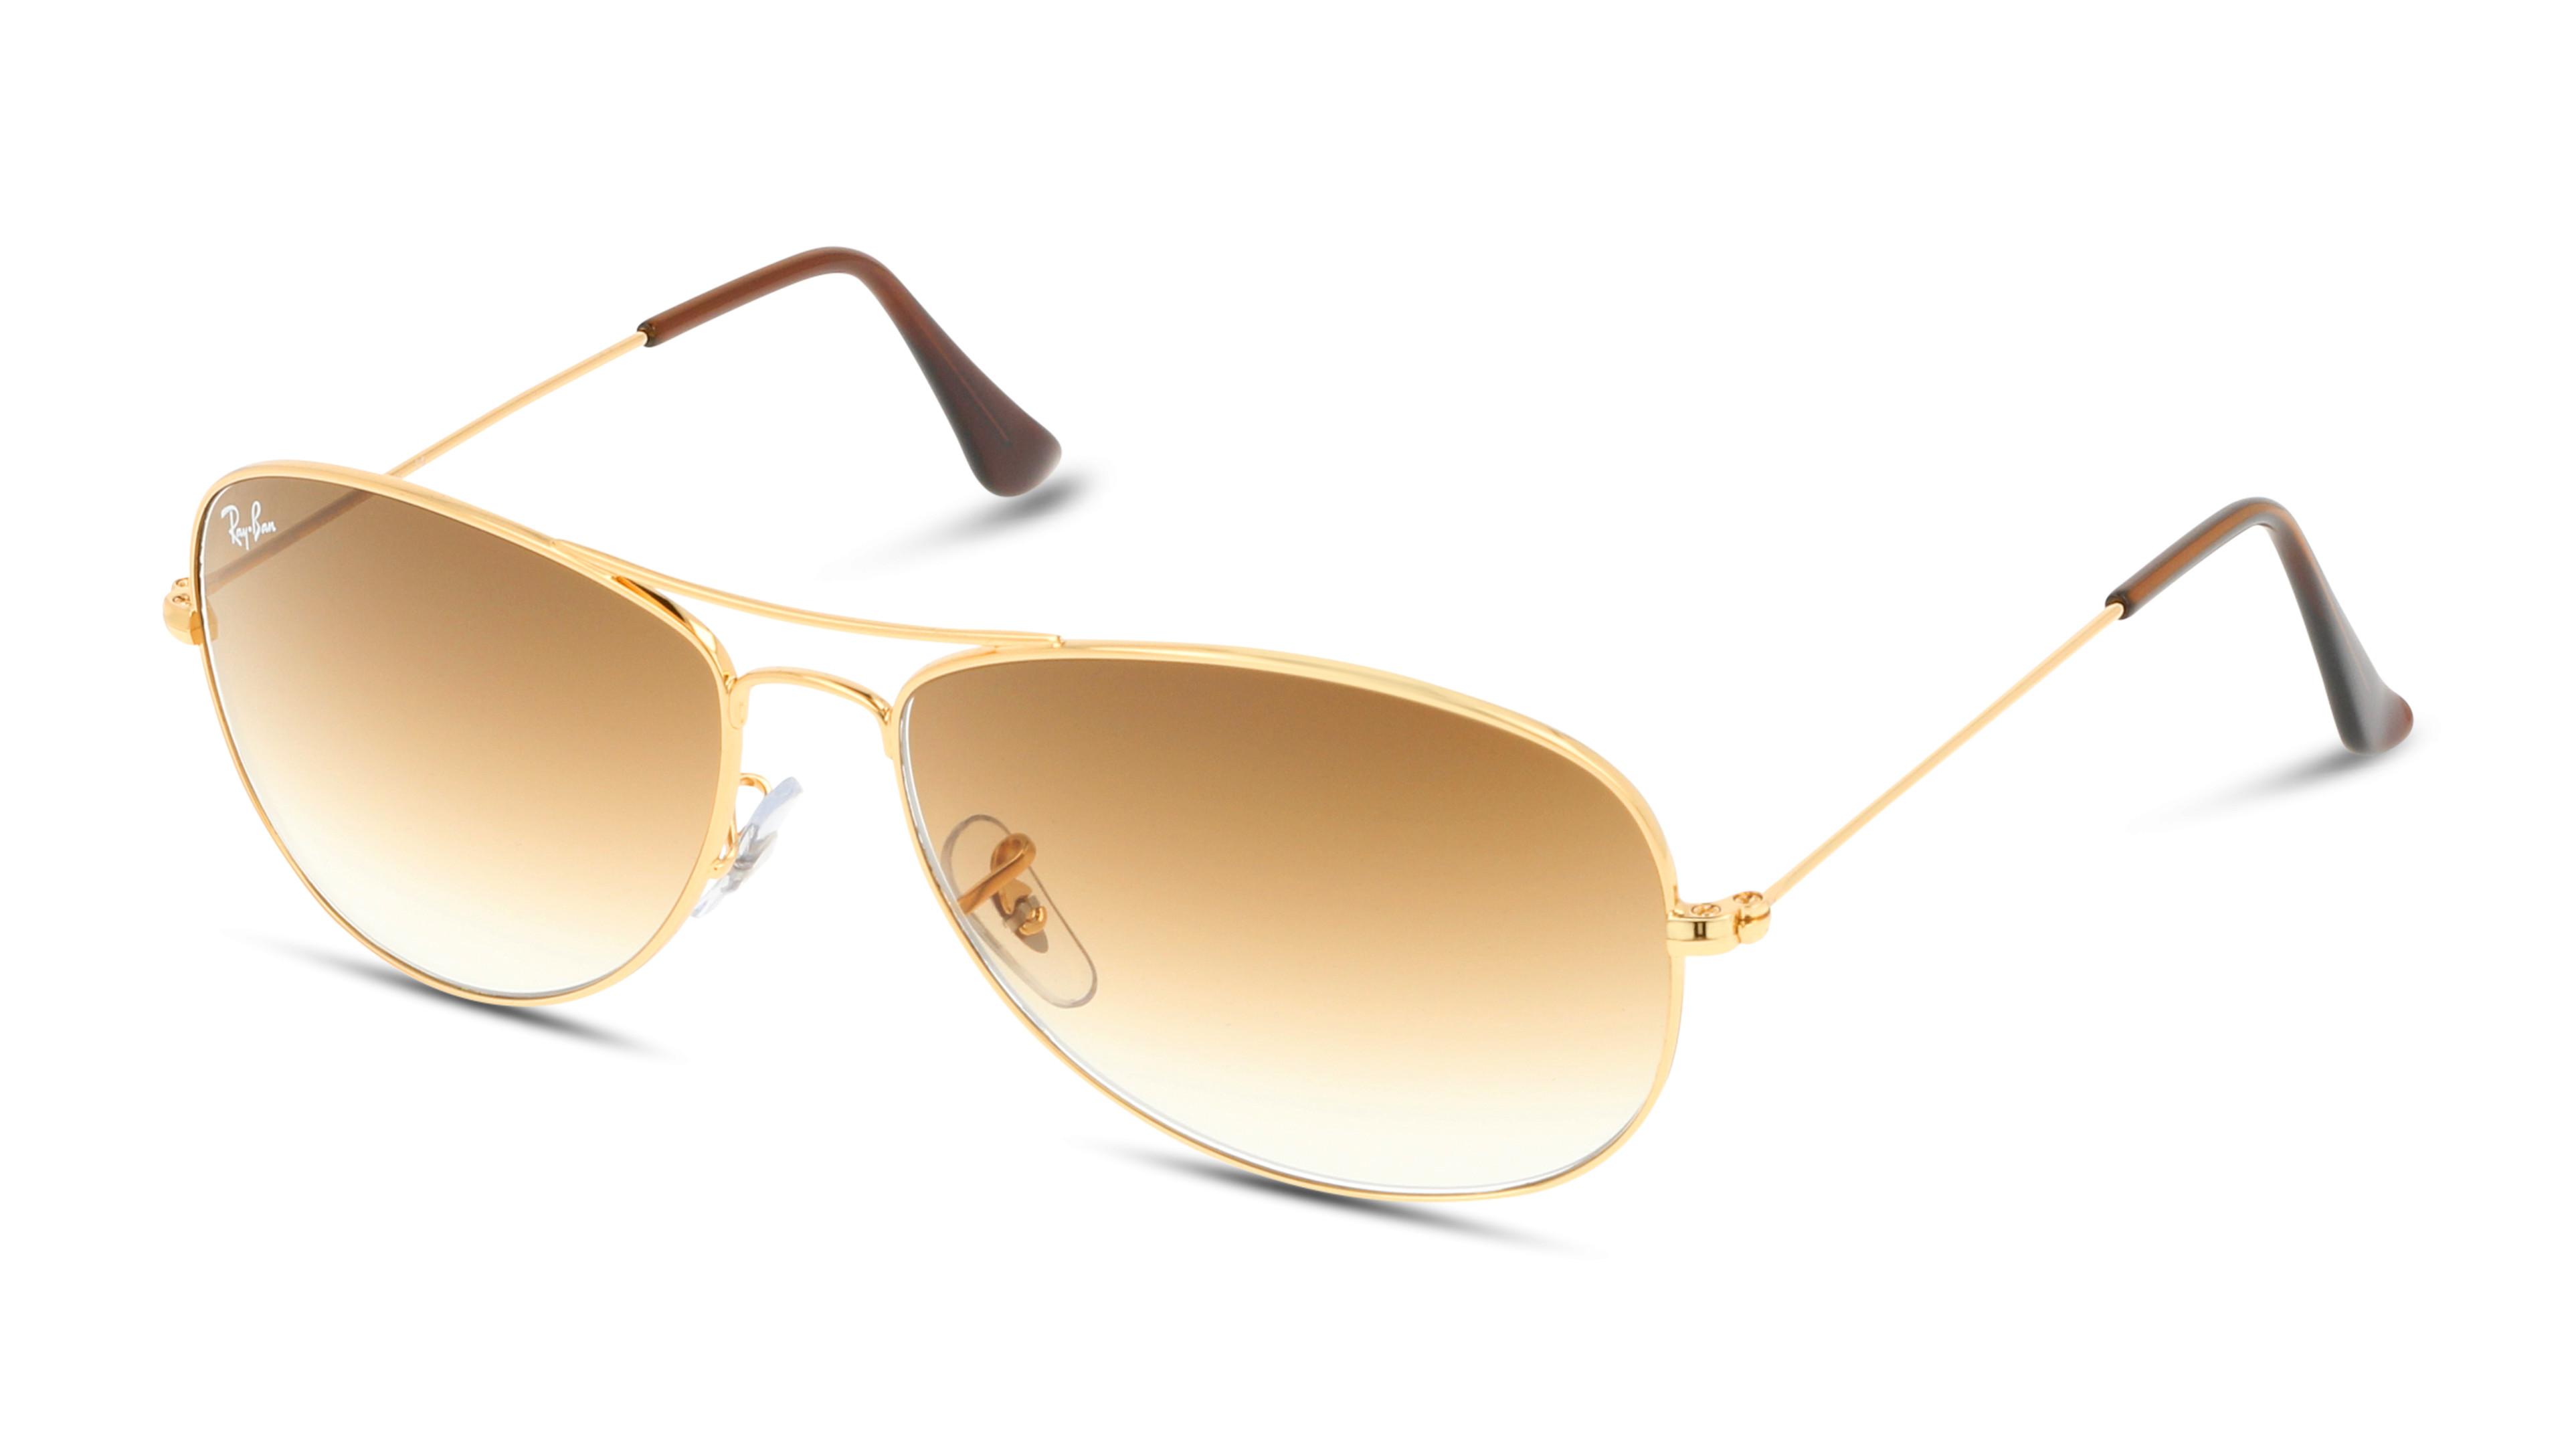 805289275268-angle-01-rayban-glasses-eyewear-pair